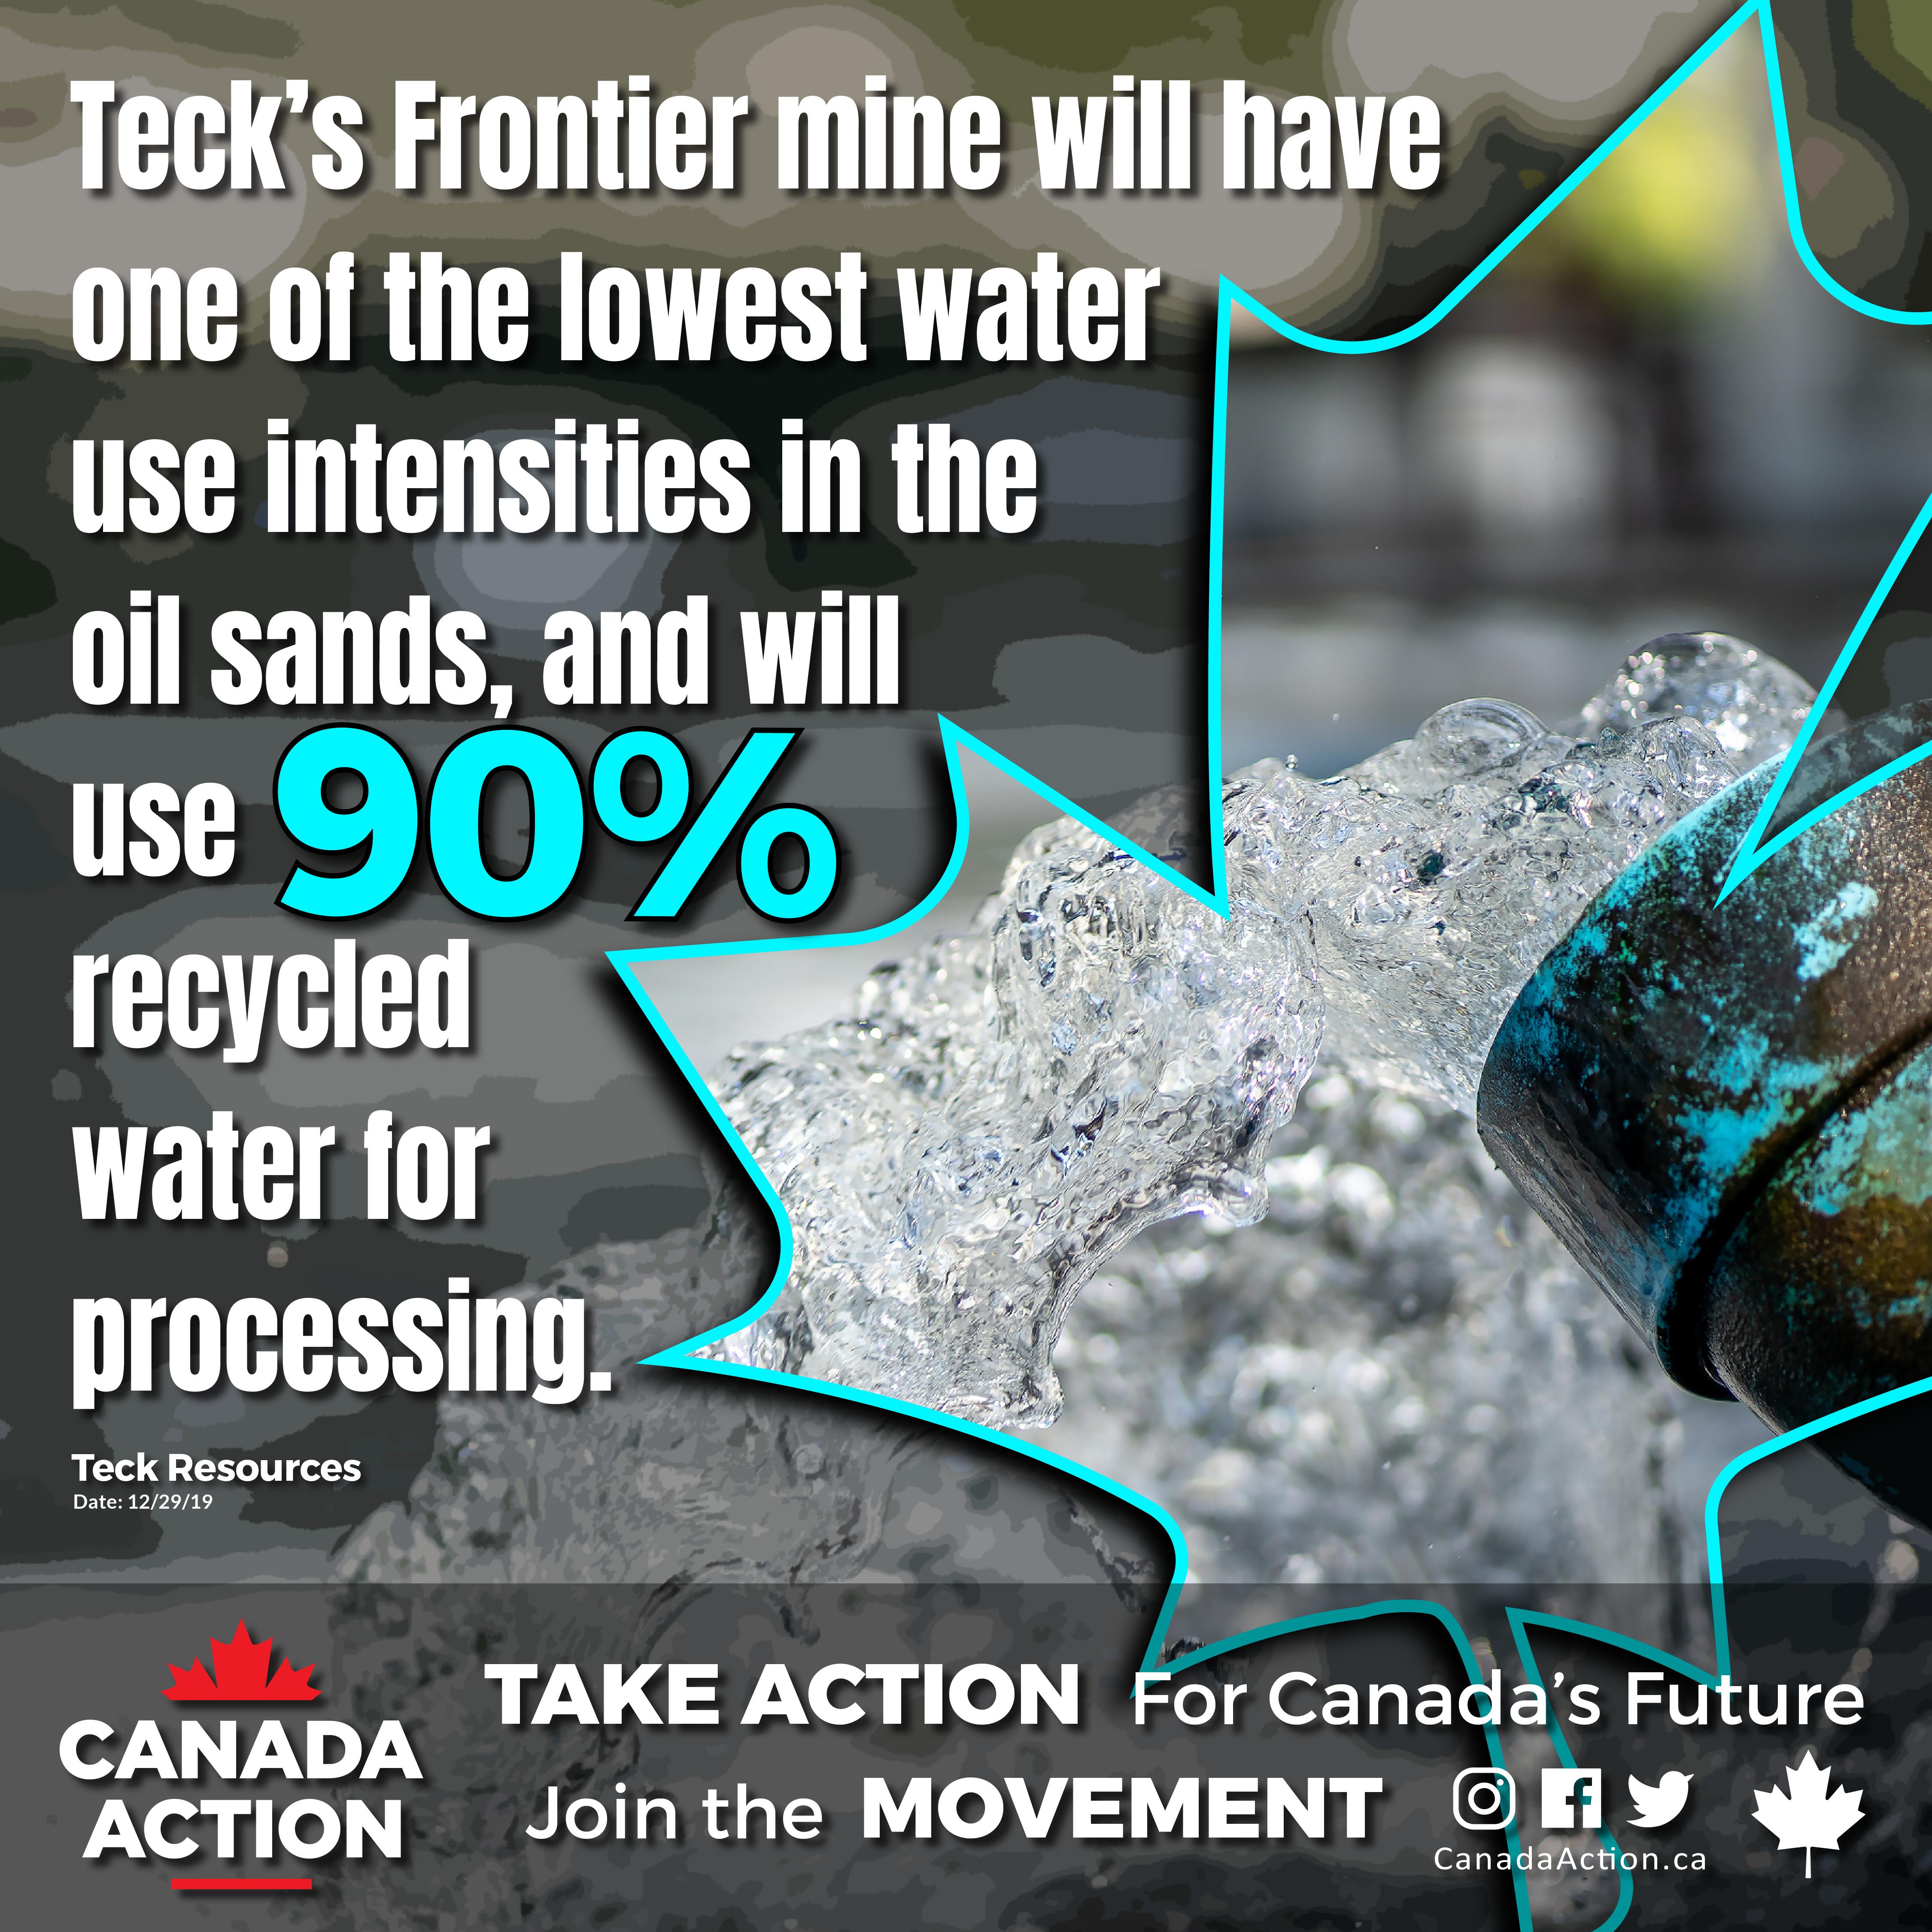 teck frontier mine water use intensity lowest in oil sands